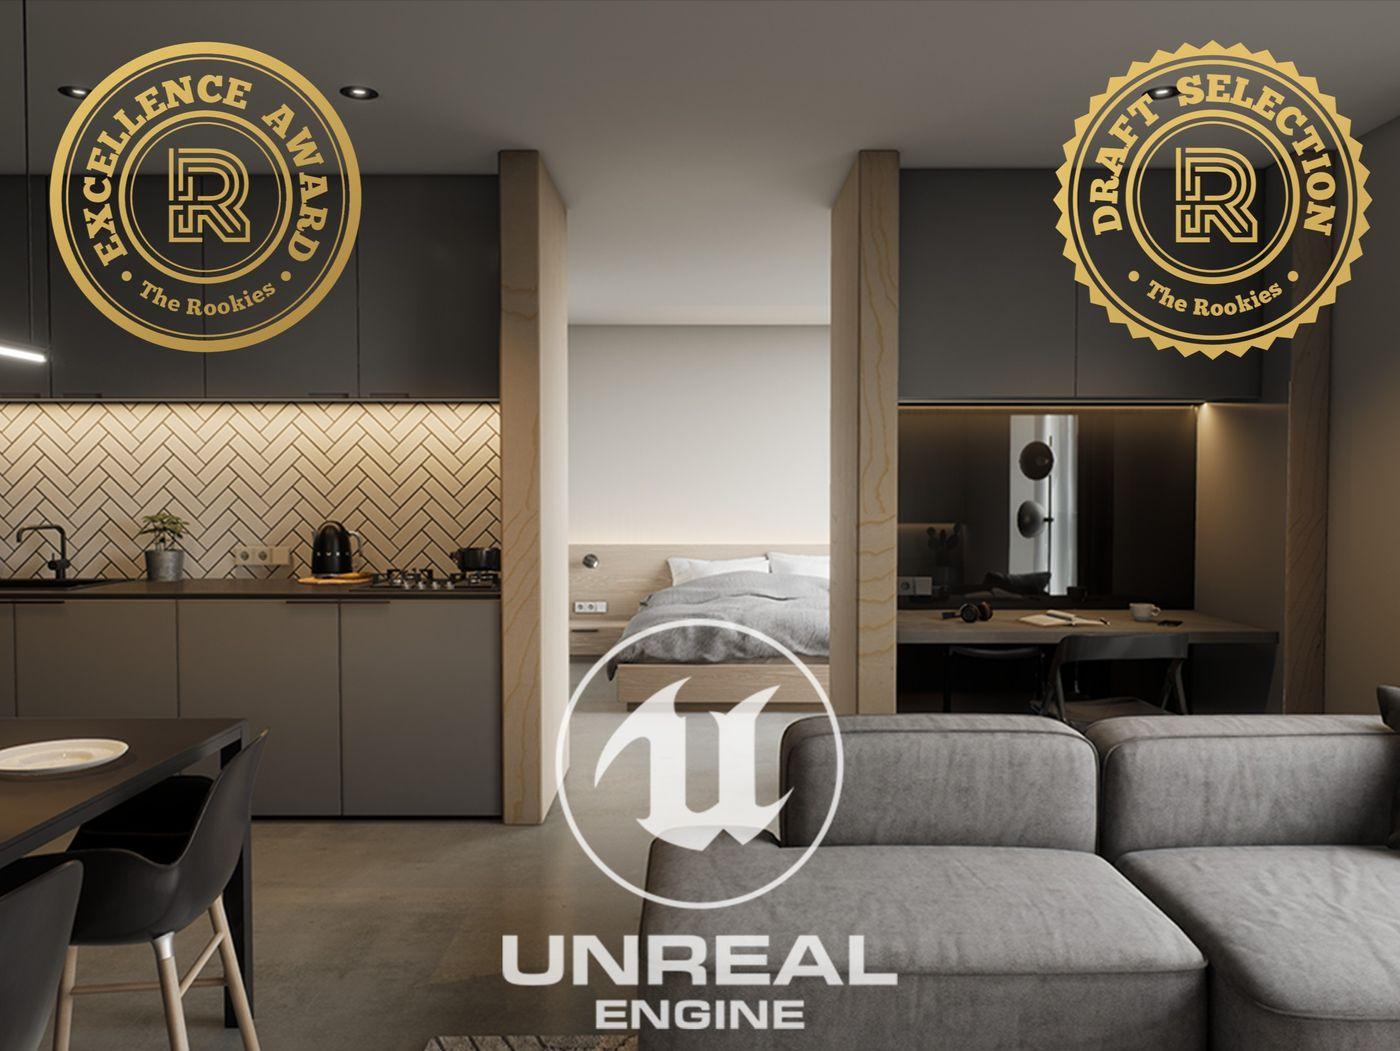 One year of ArchViz in Unreal Engine 4